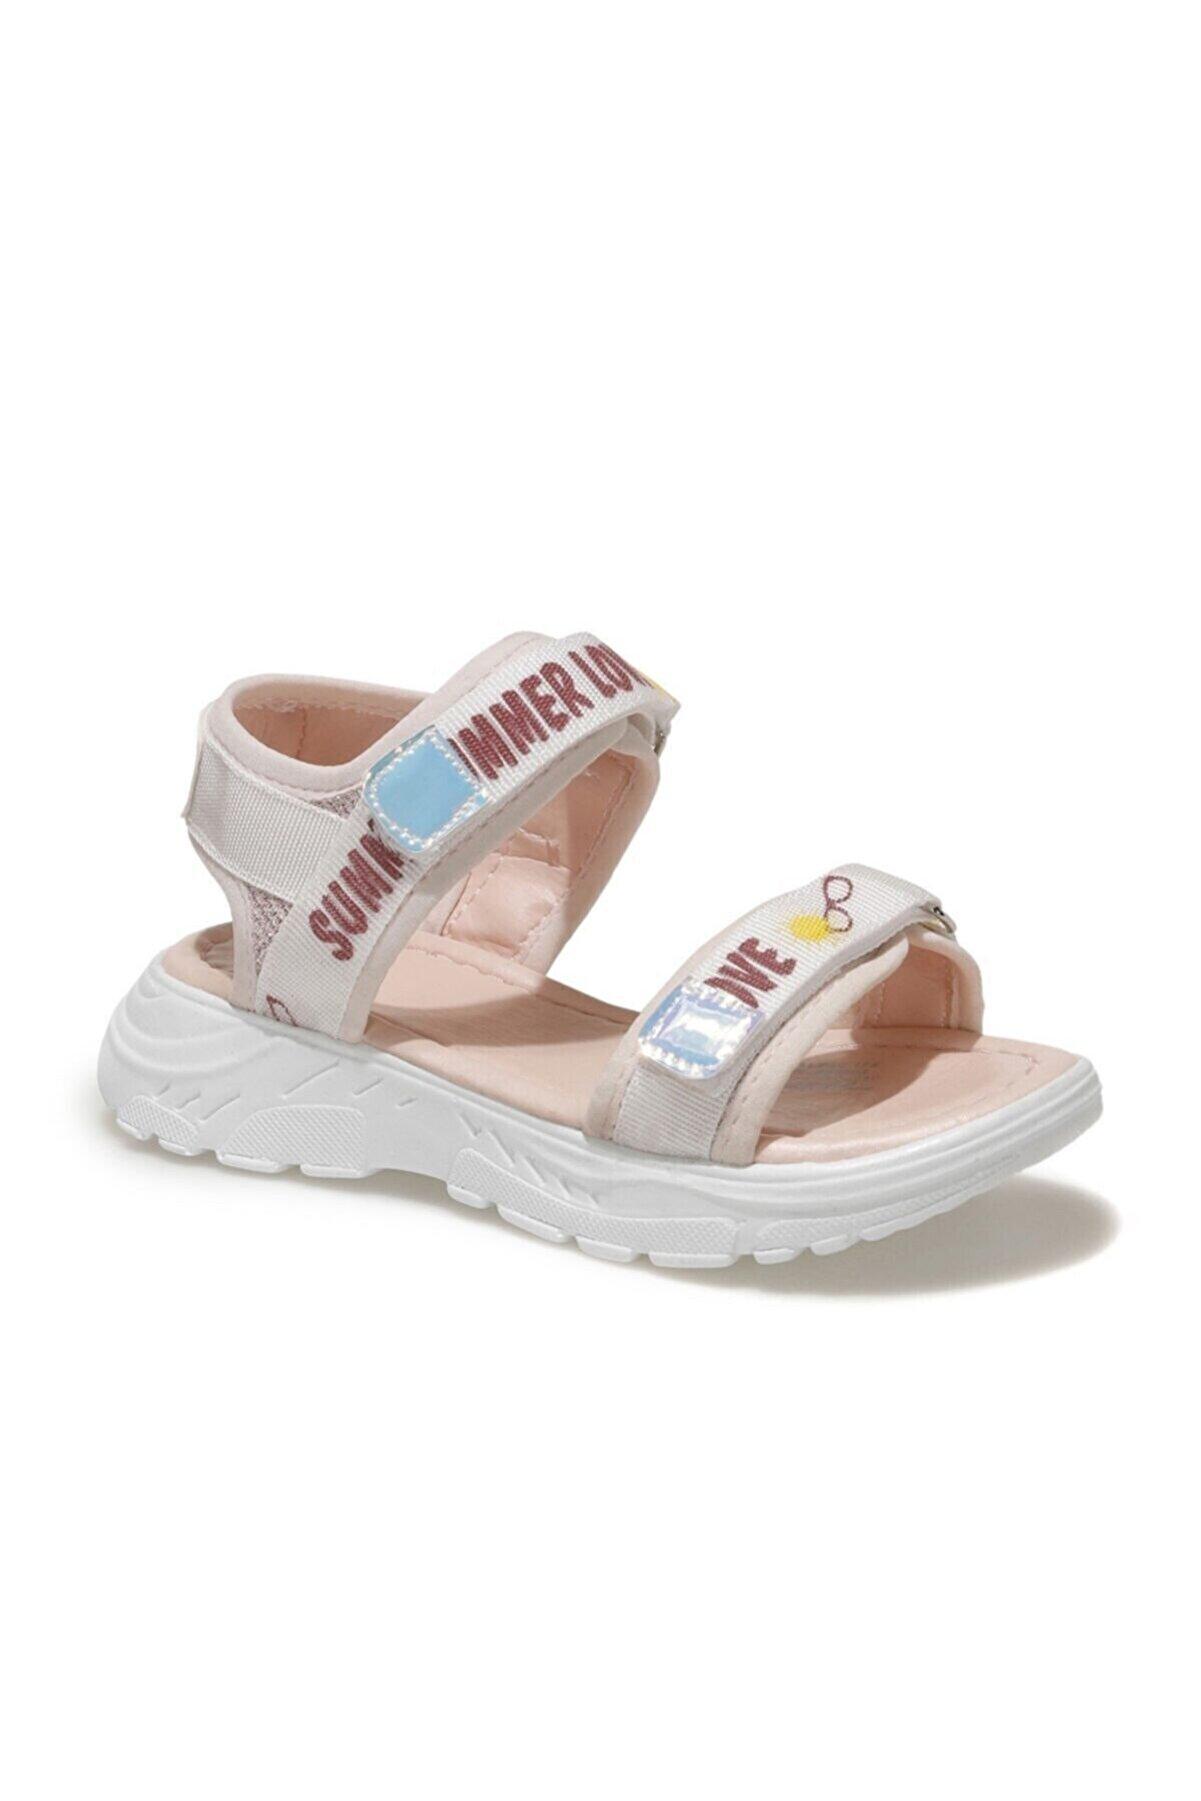 SEVENTEEN BALZAC 1FX Pembe Kız Çocuk Sandalet 101029293